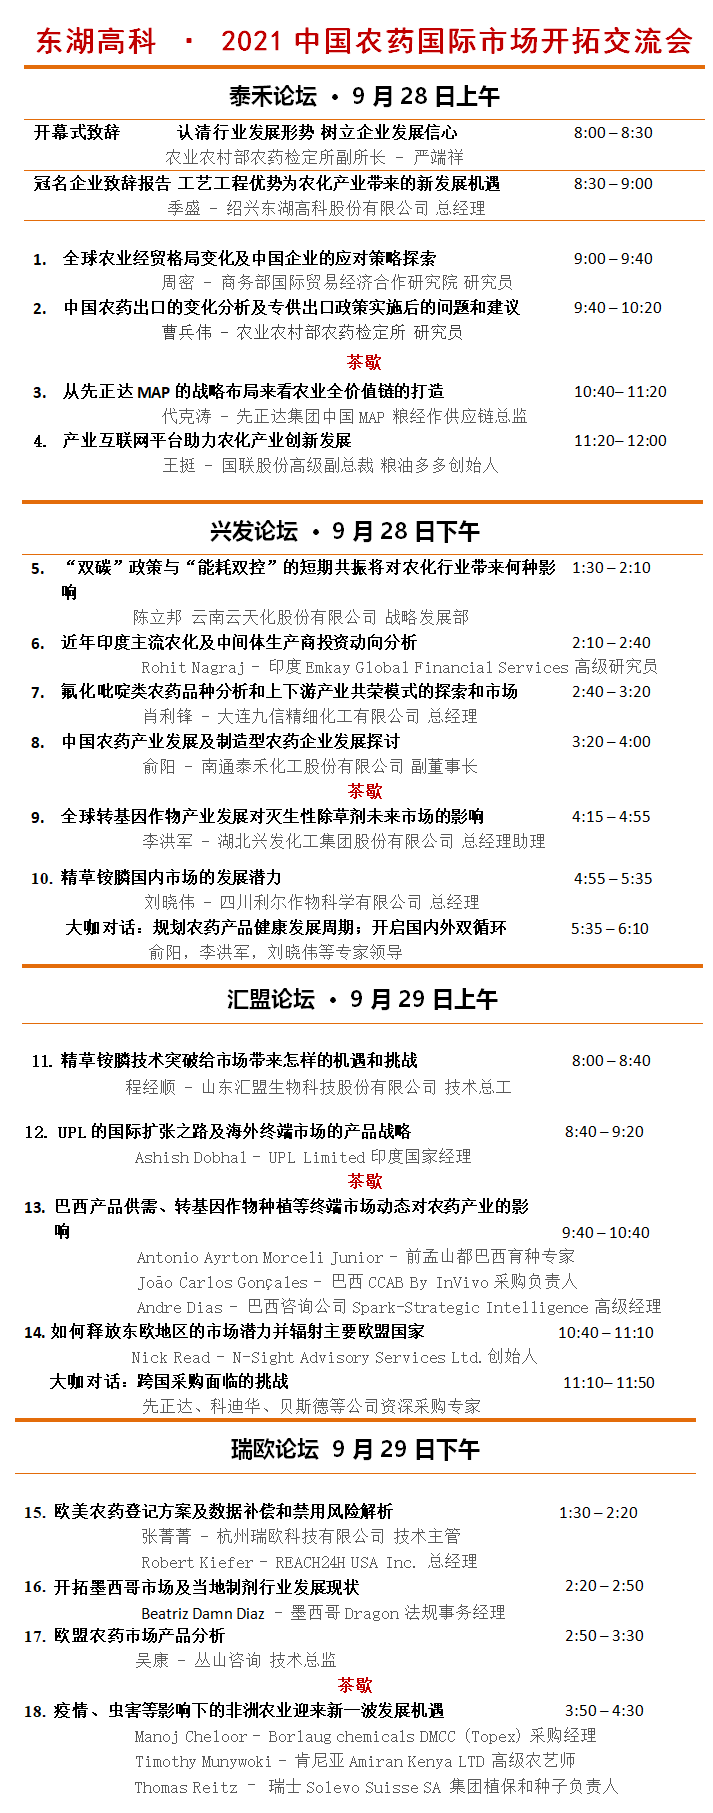 2021议程-中文.png